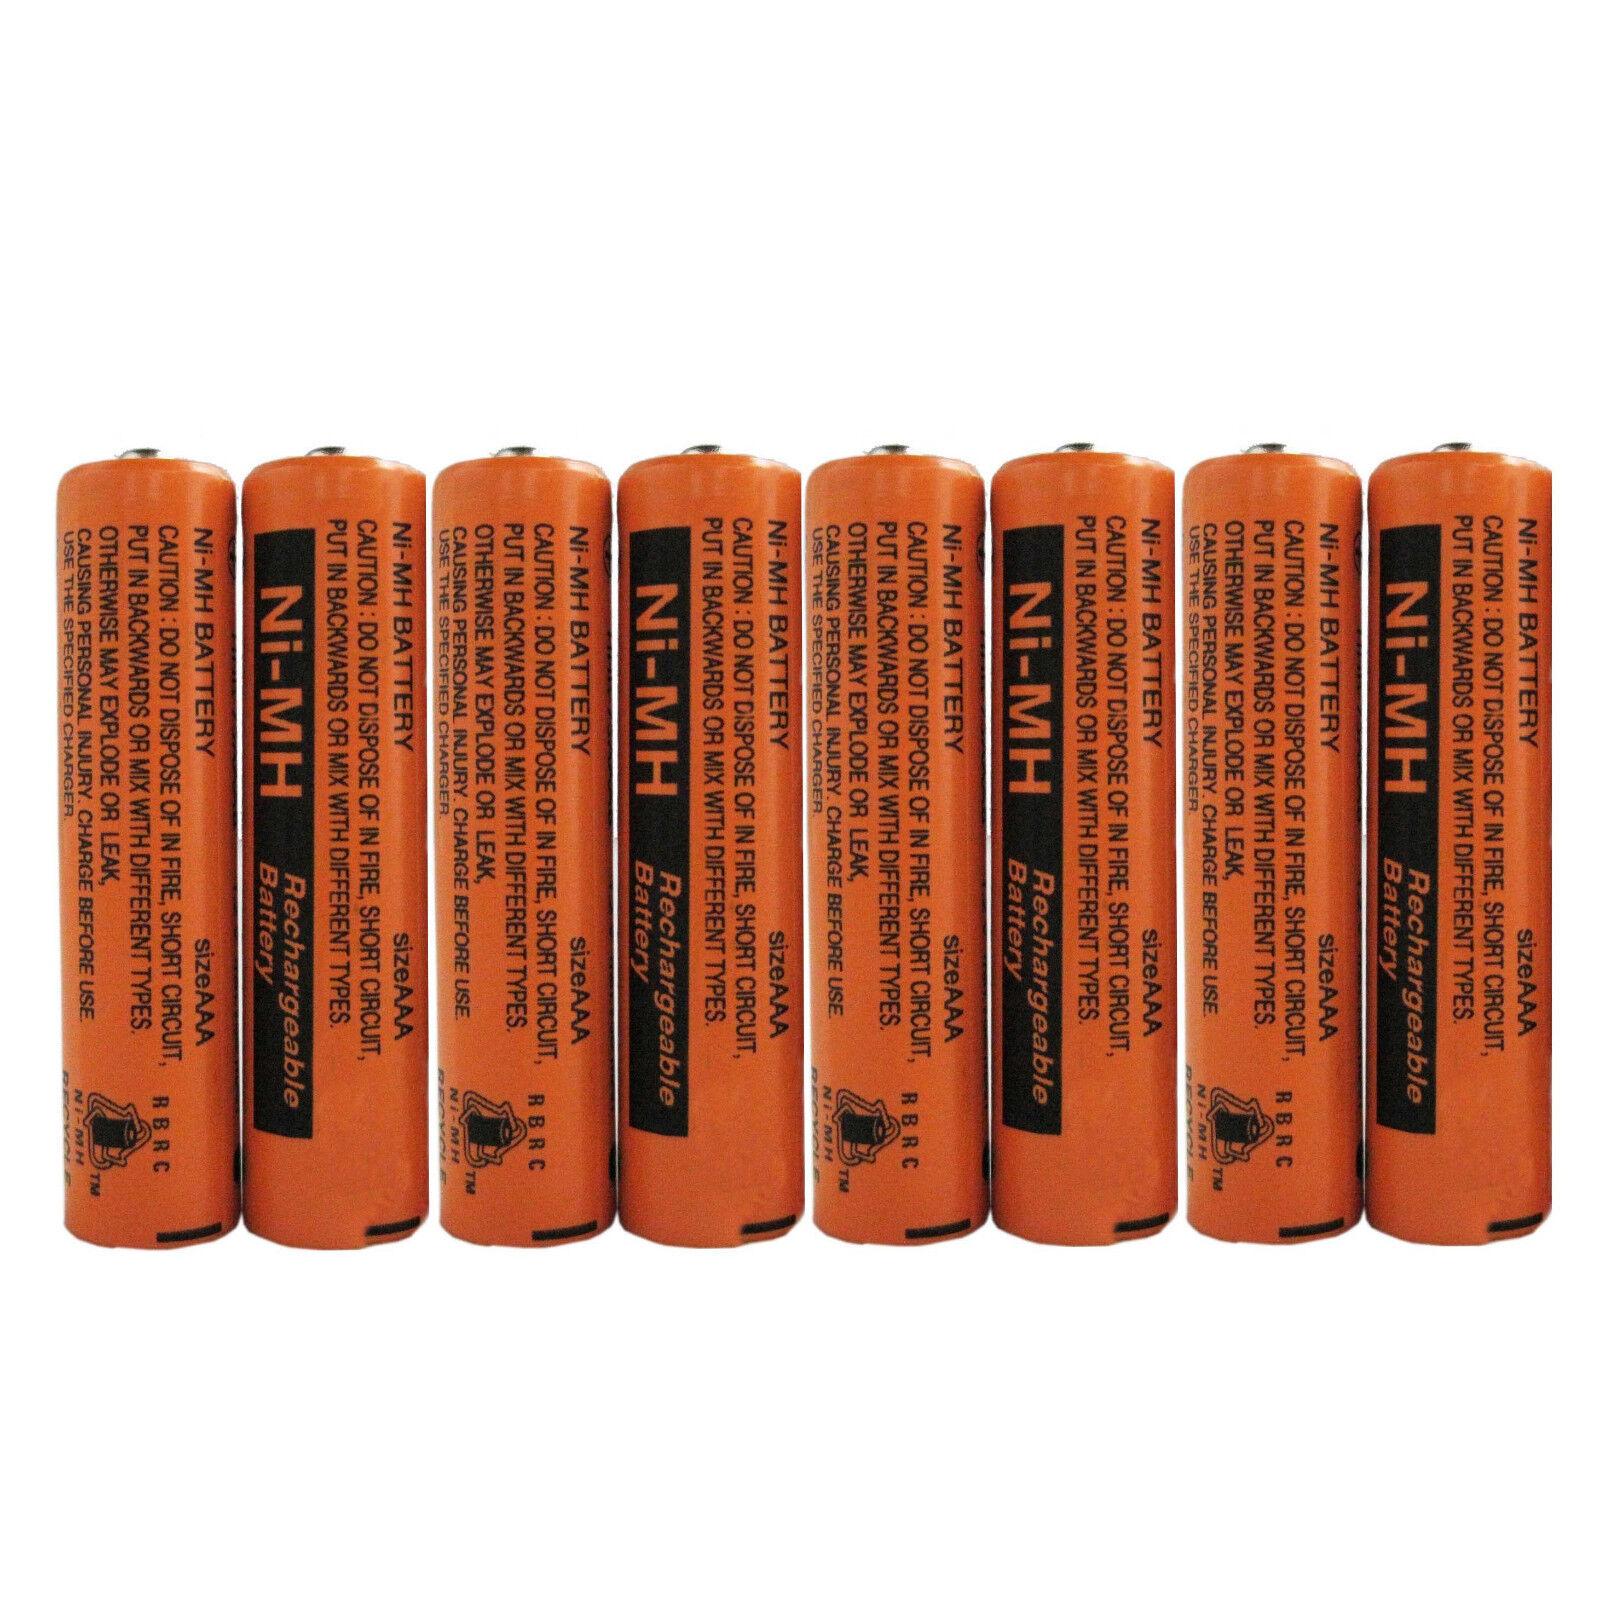 2~8 Pcs 700mAh Panasonic NiMH AAA Rechargeable Battery For Cordless Phones New